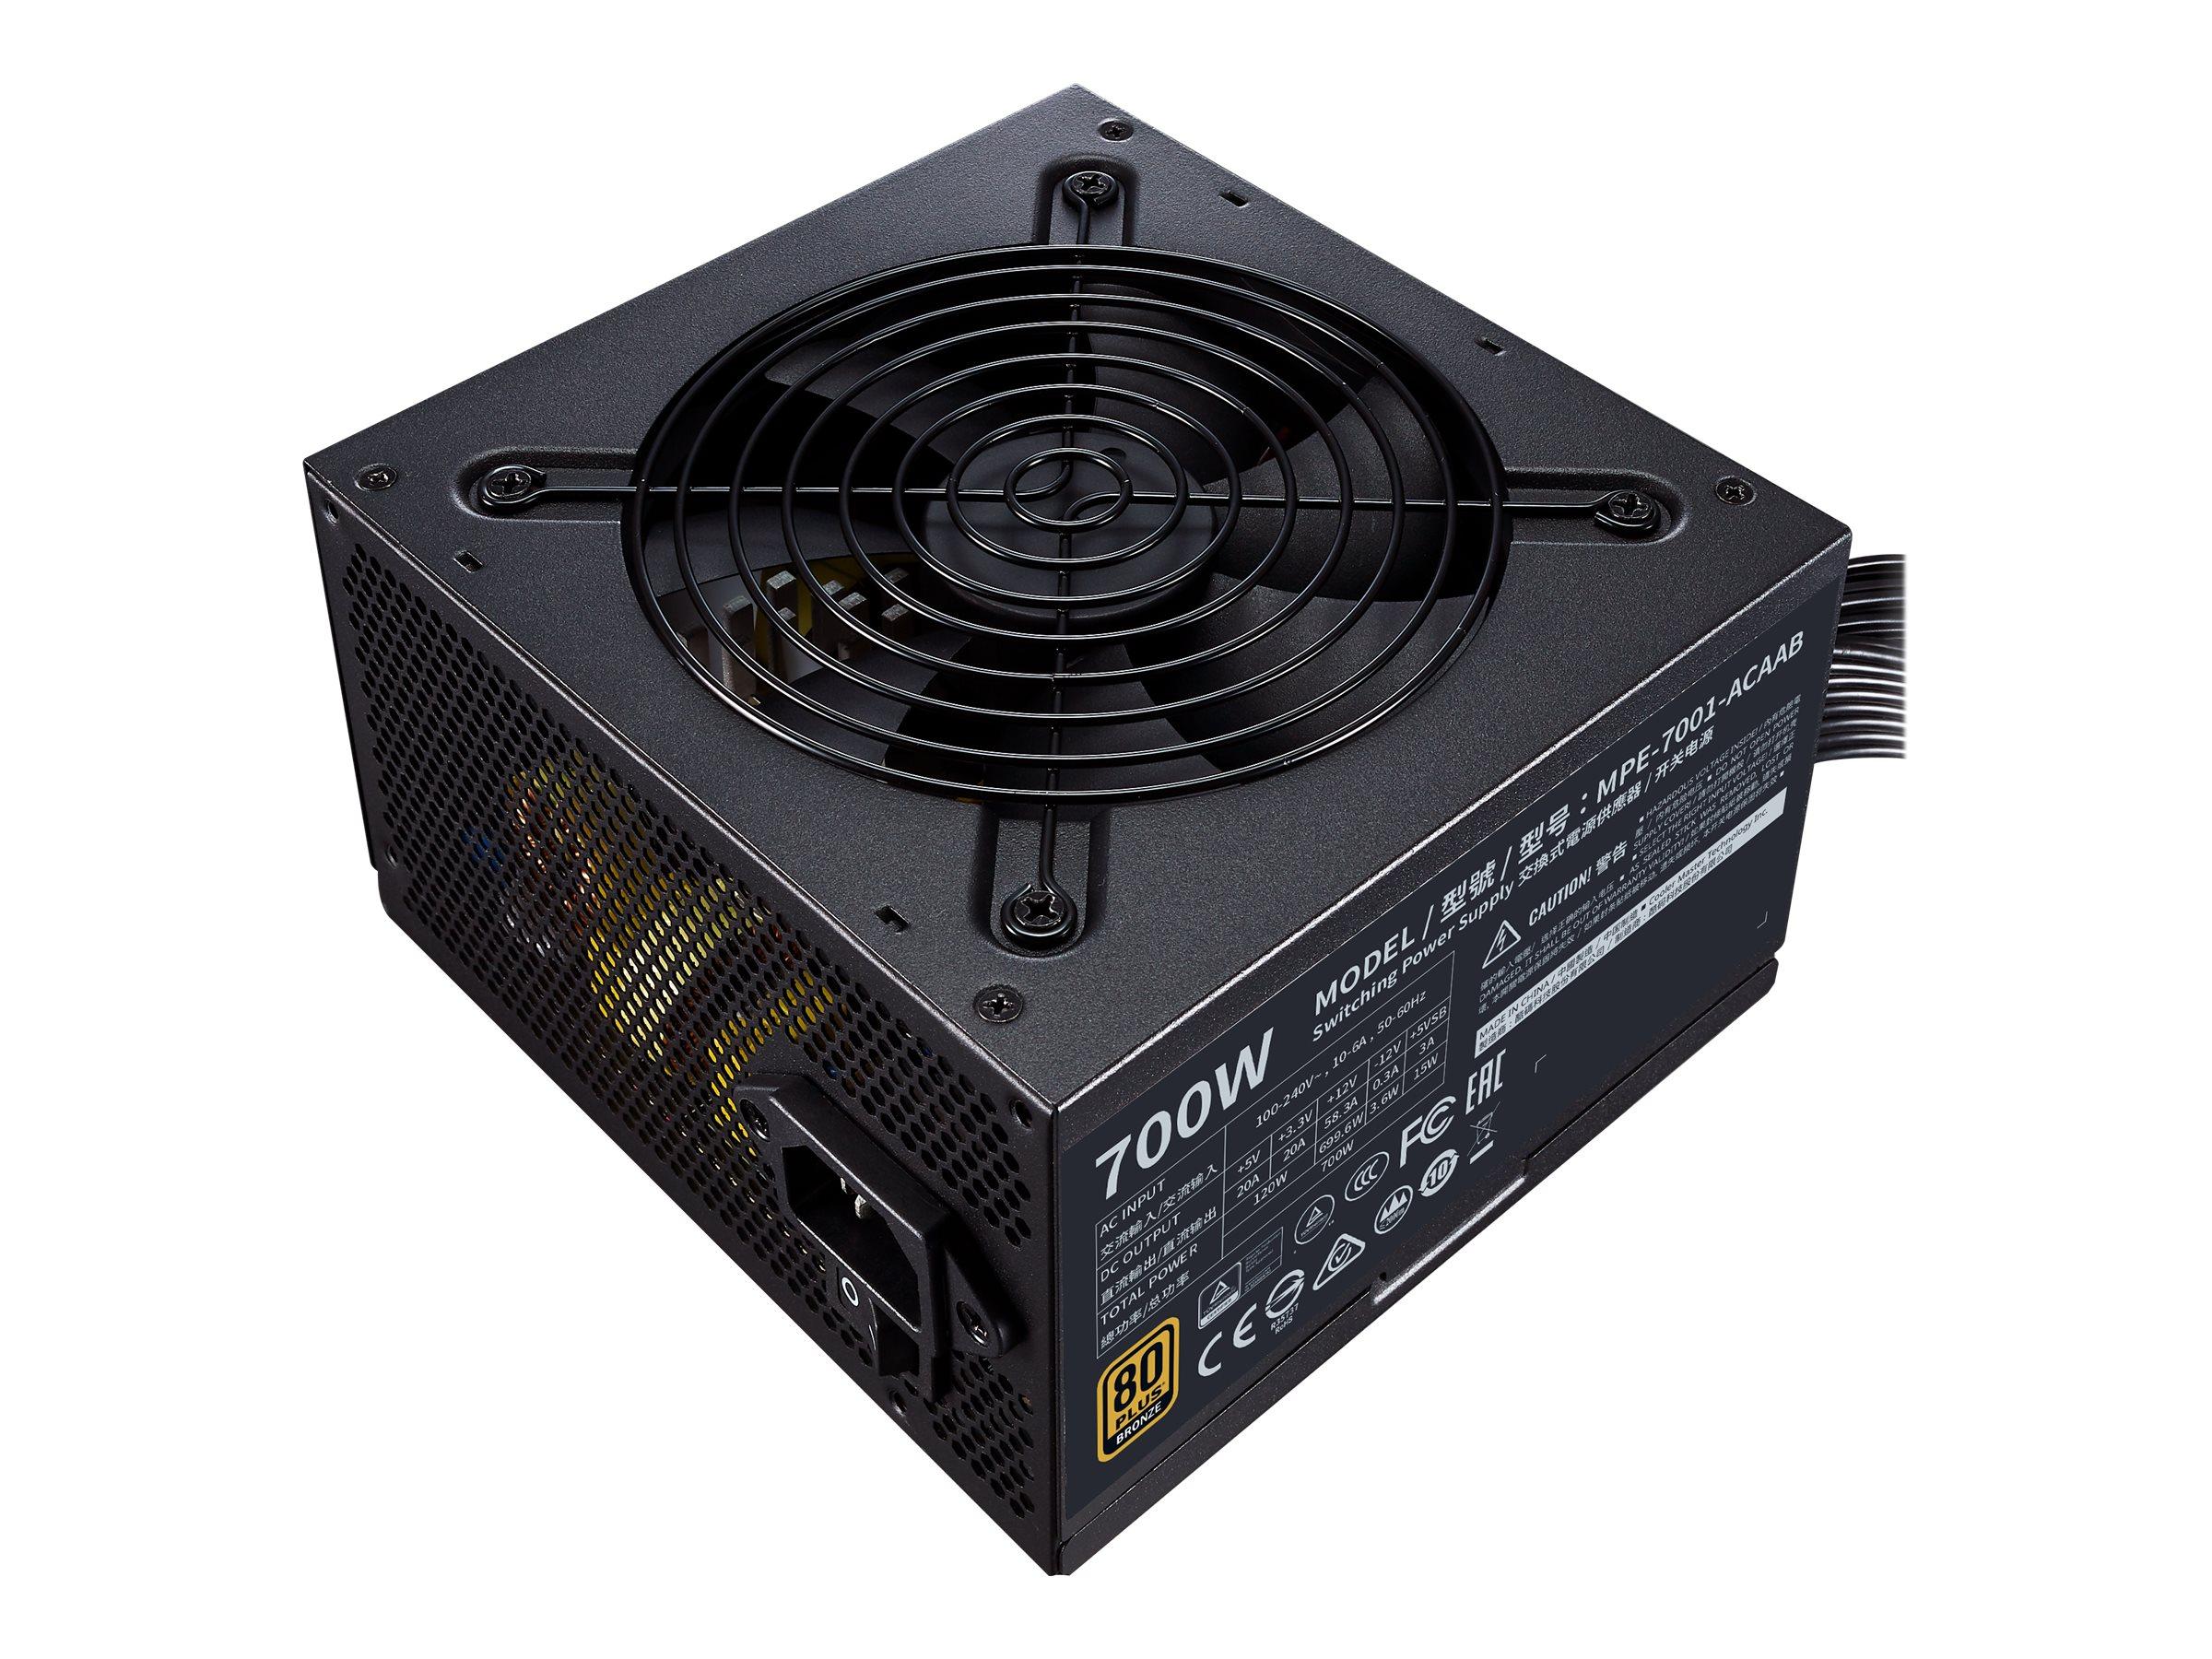 Cooler Master MWE Bronze V2 700 - Stromversorgung (intern)